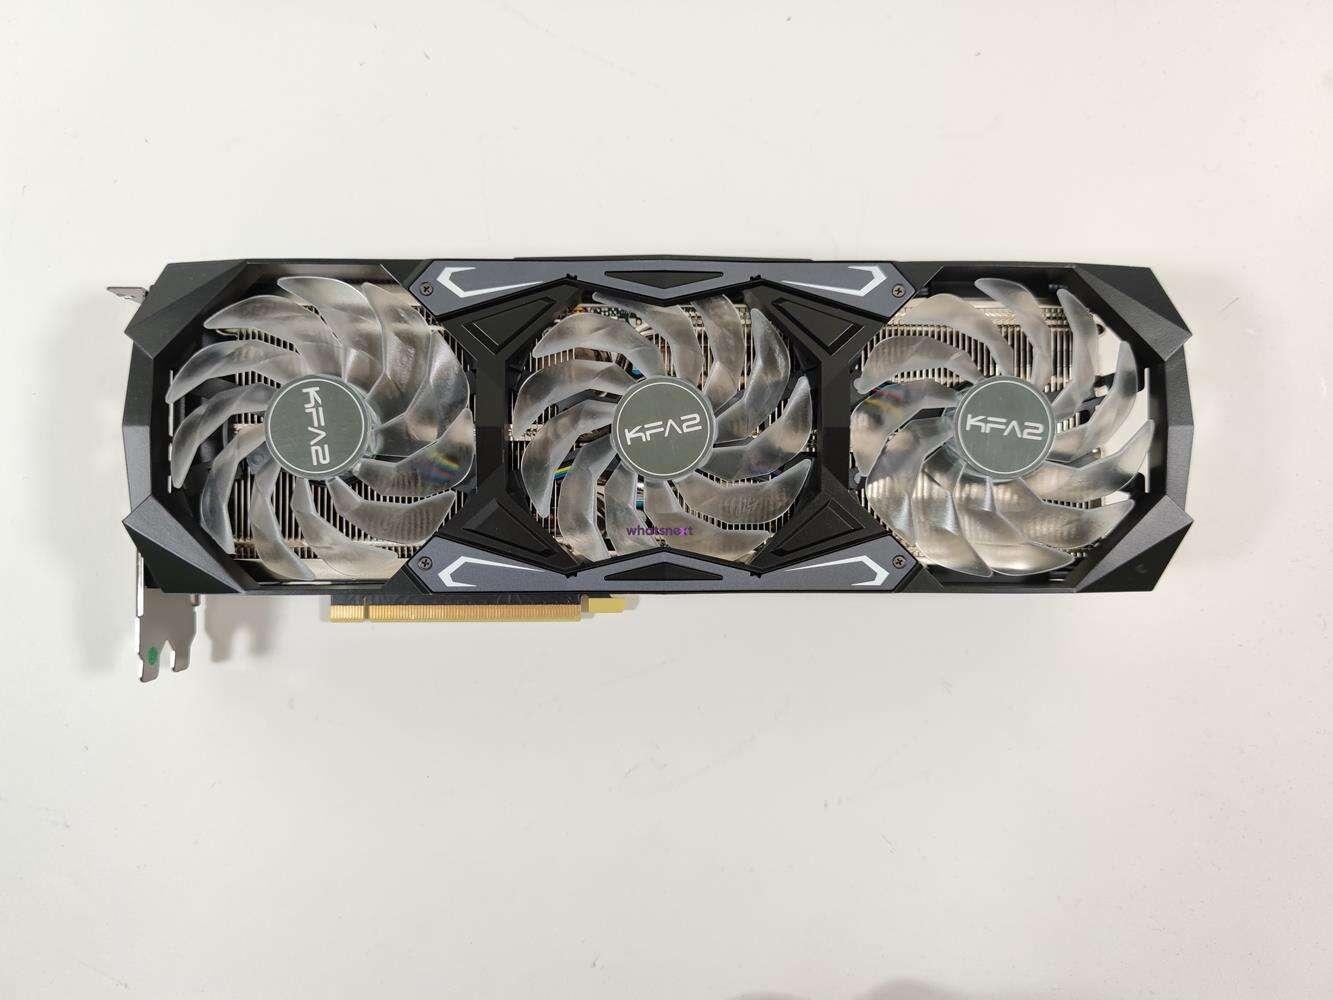 test KFA2 GeForce RTX 3080 Ti SG (1-Click OC), recenzja KFA2 GeForce RTX 3080 Ti SG (1-Click OC), opinia KFA2 GeForce RTX 3080 Ti SG (1-Click OC)